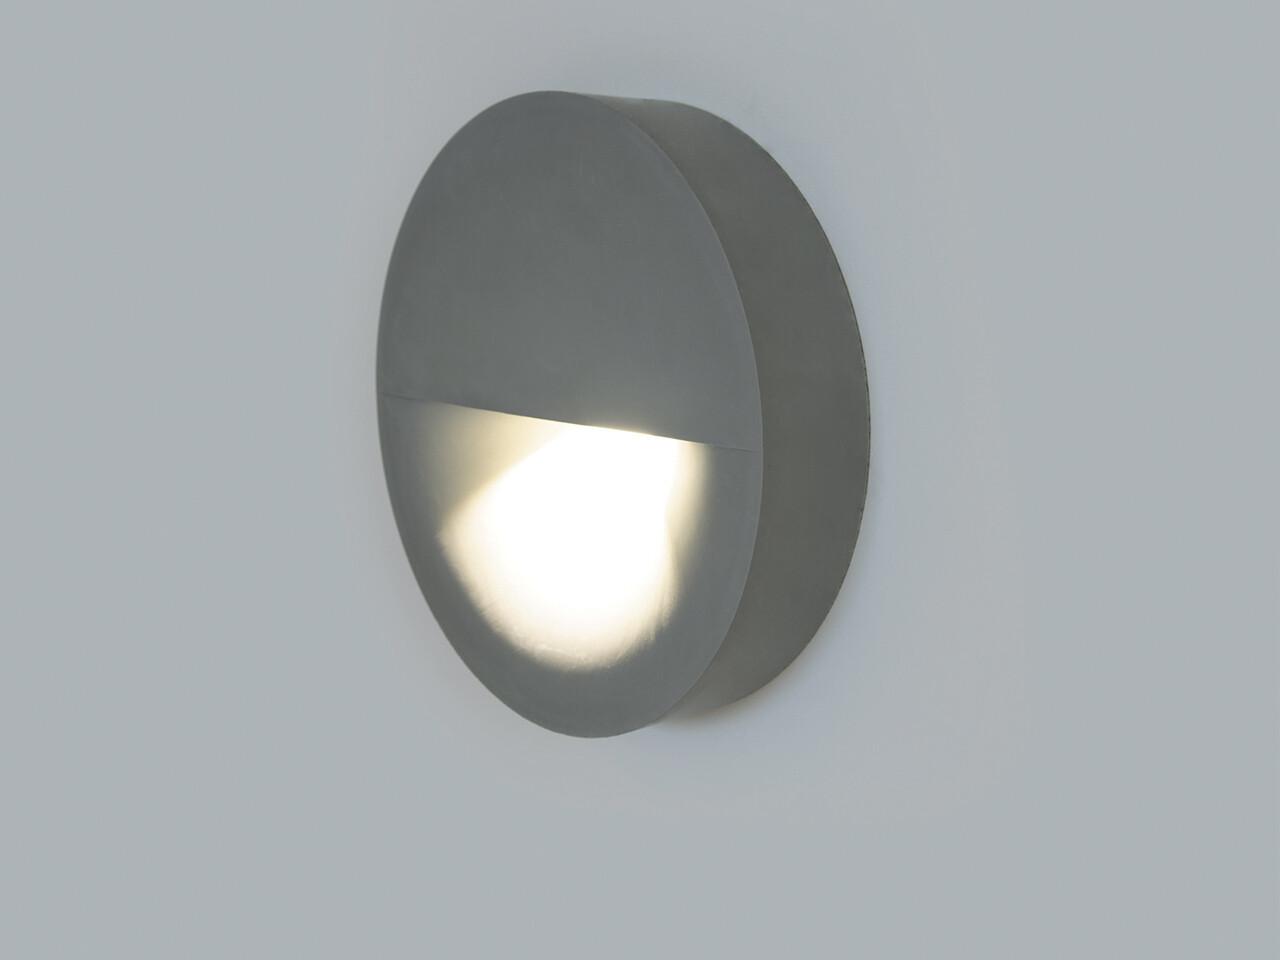 9010 Wandleuchte LEVICO LED 10W, IP65, grün